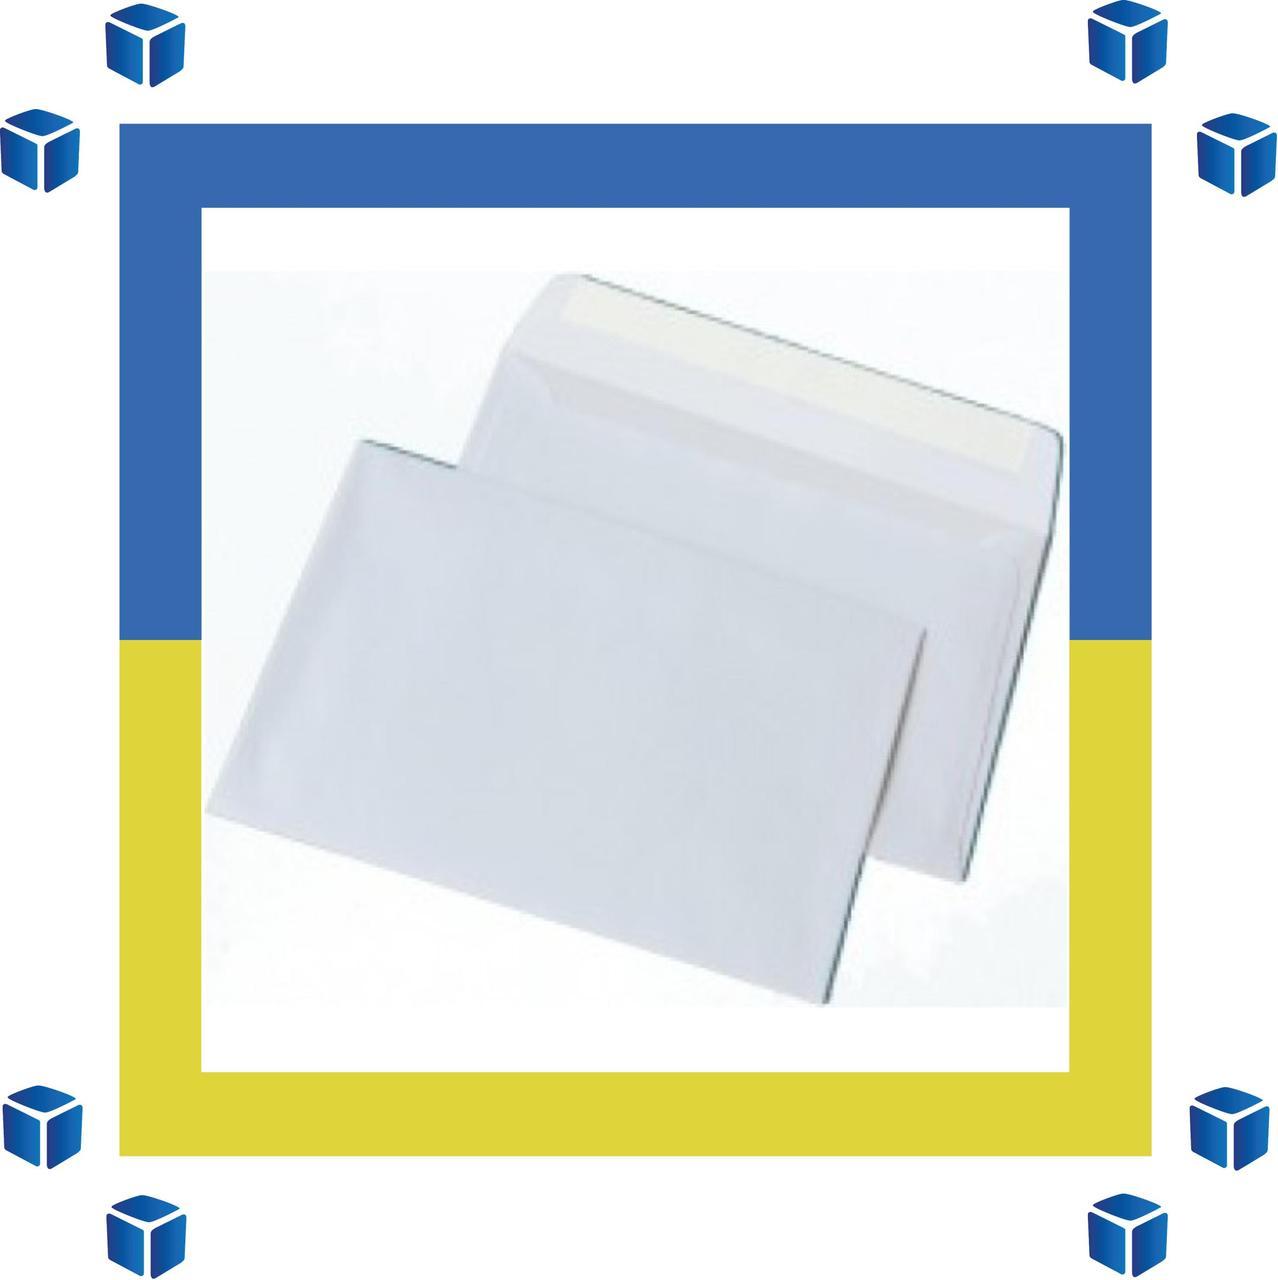 Конверт С5 MINI (155х220) ск, белый  (0+0)